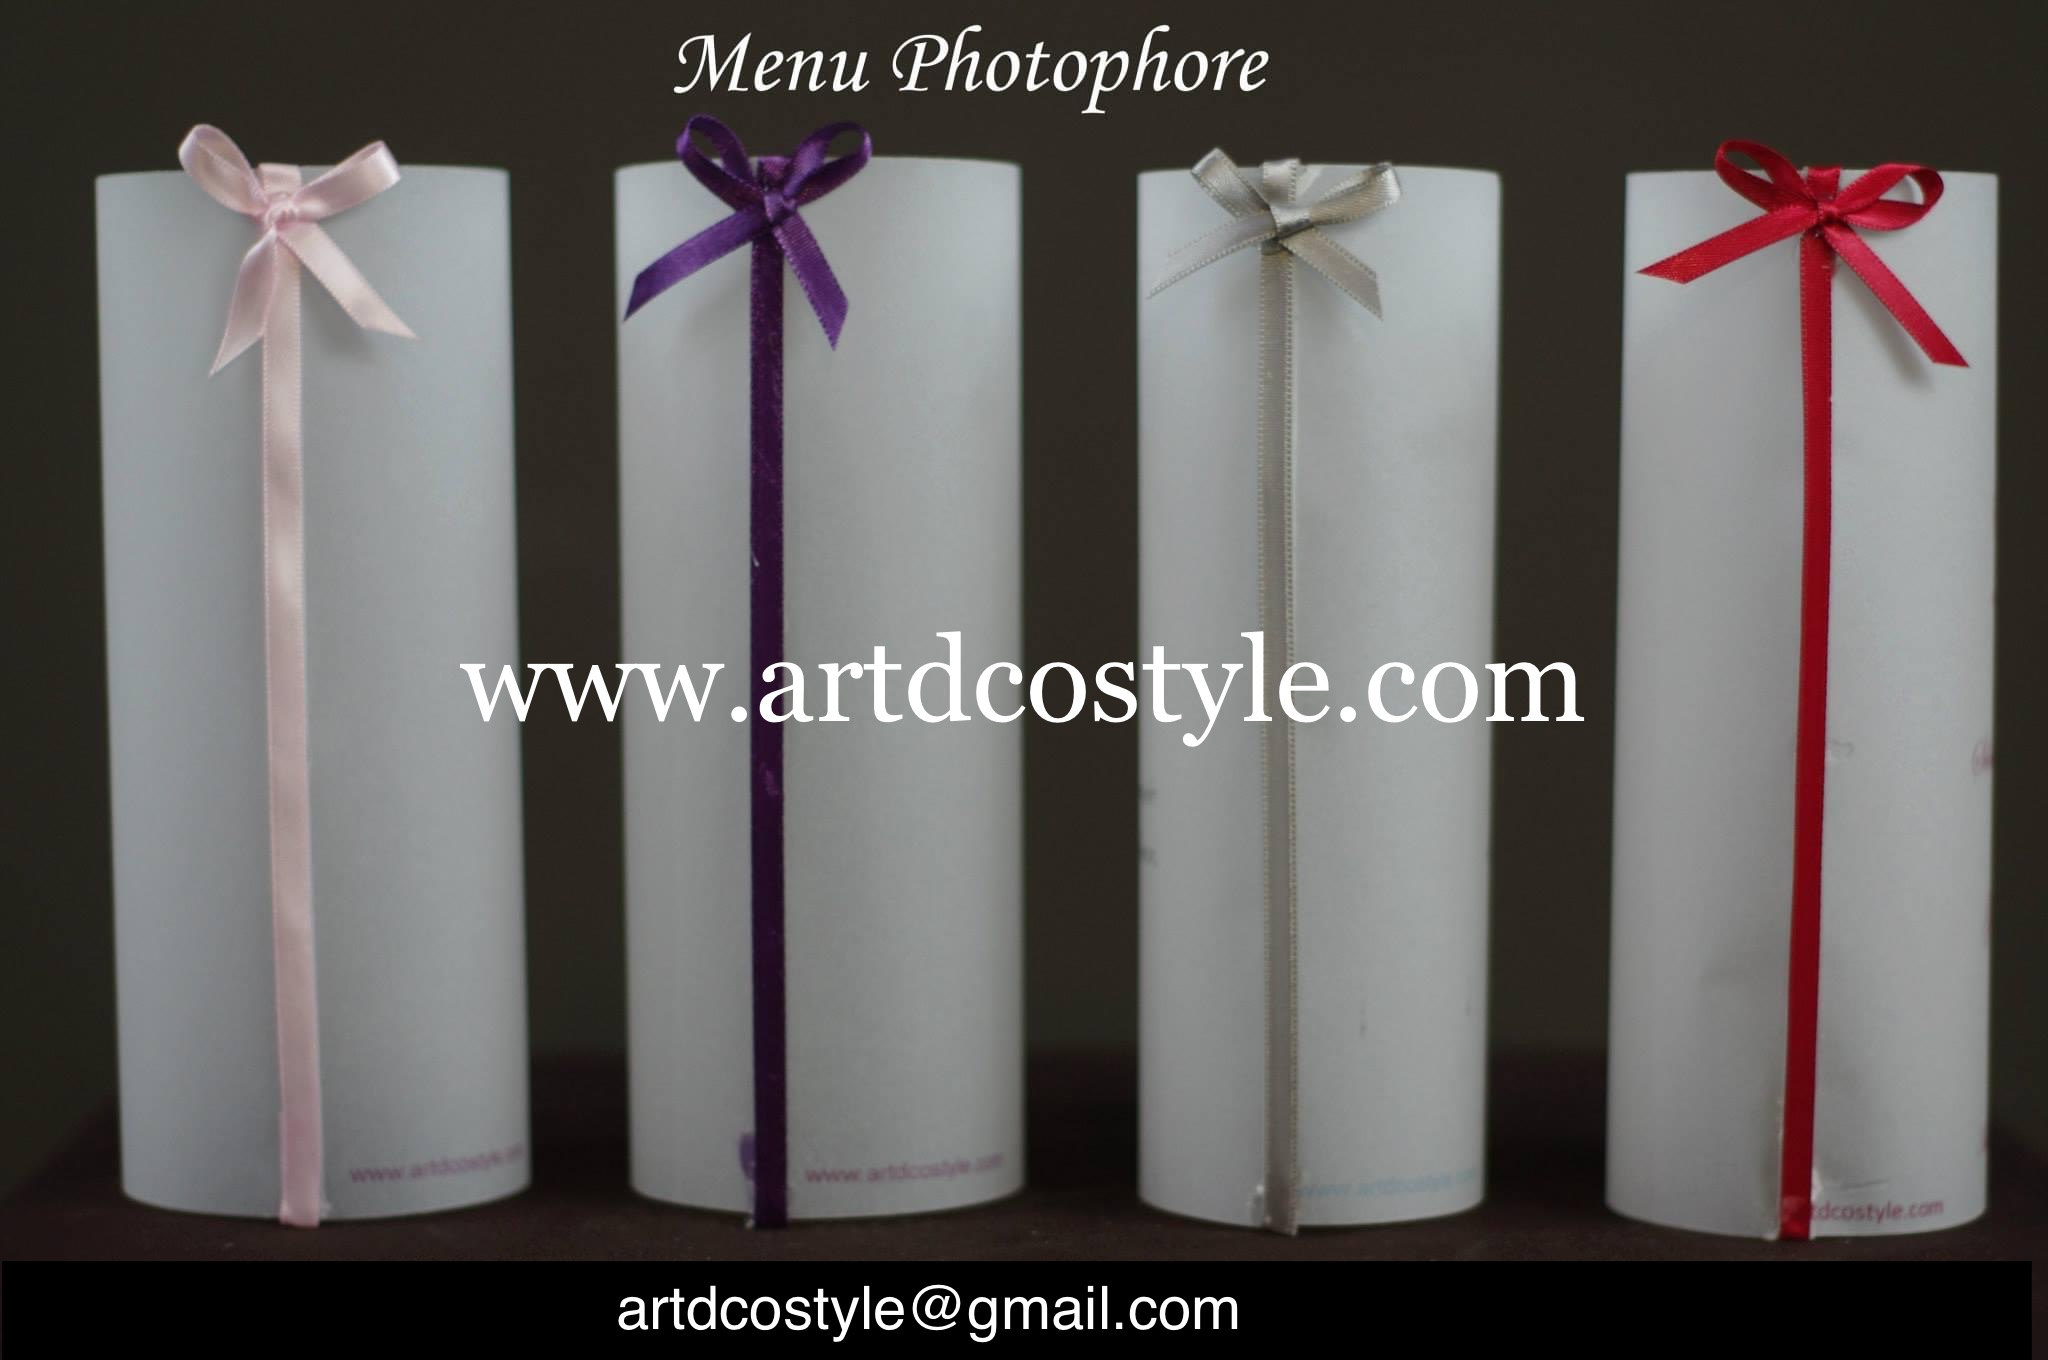 menu photophore mariage